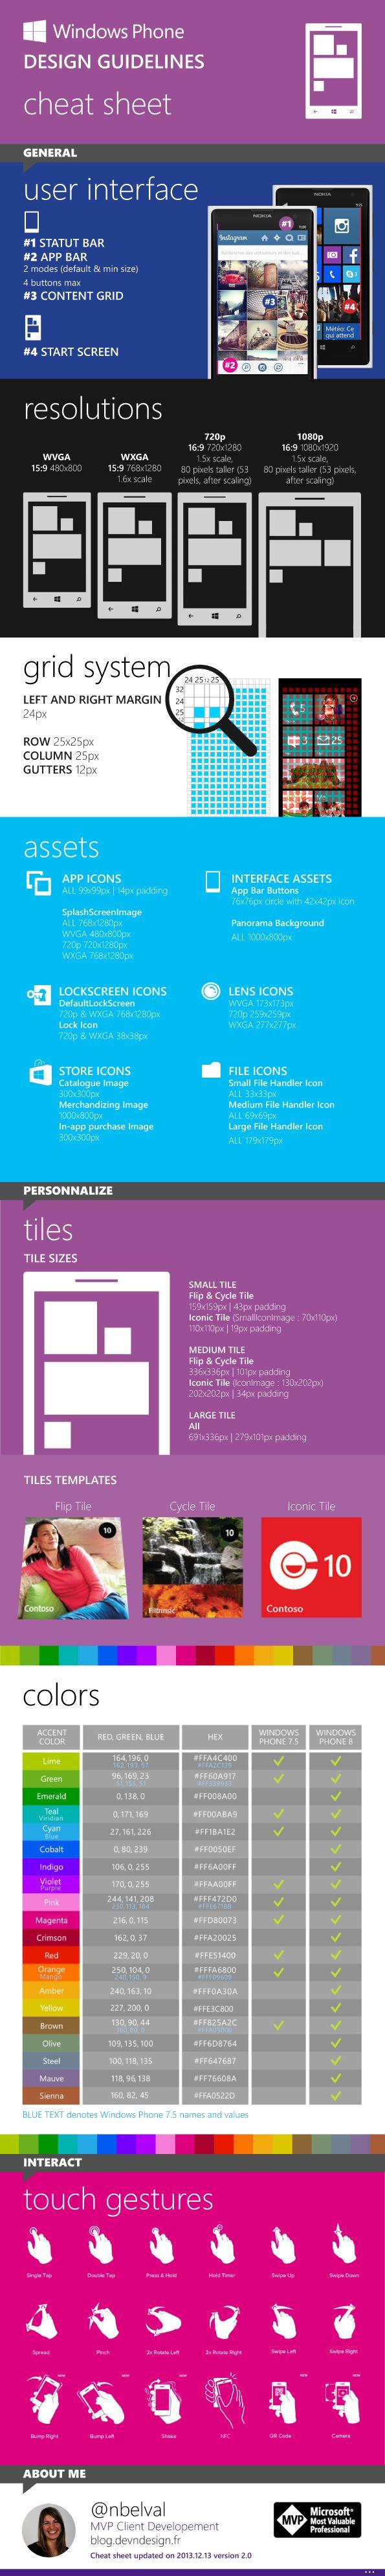 Windows Phone design guidelines cheat sheet